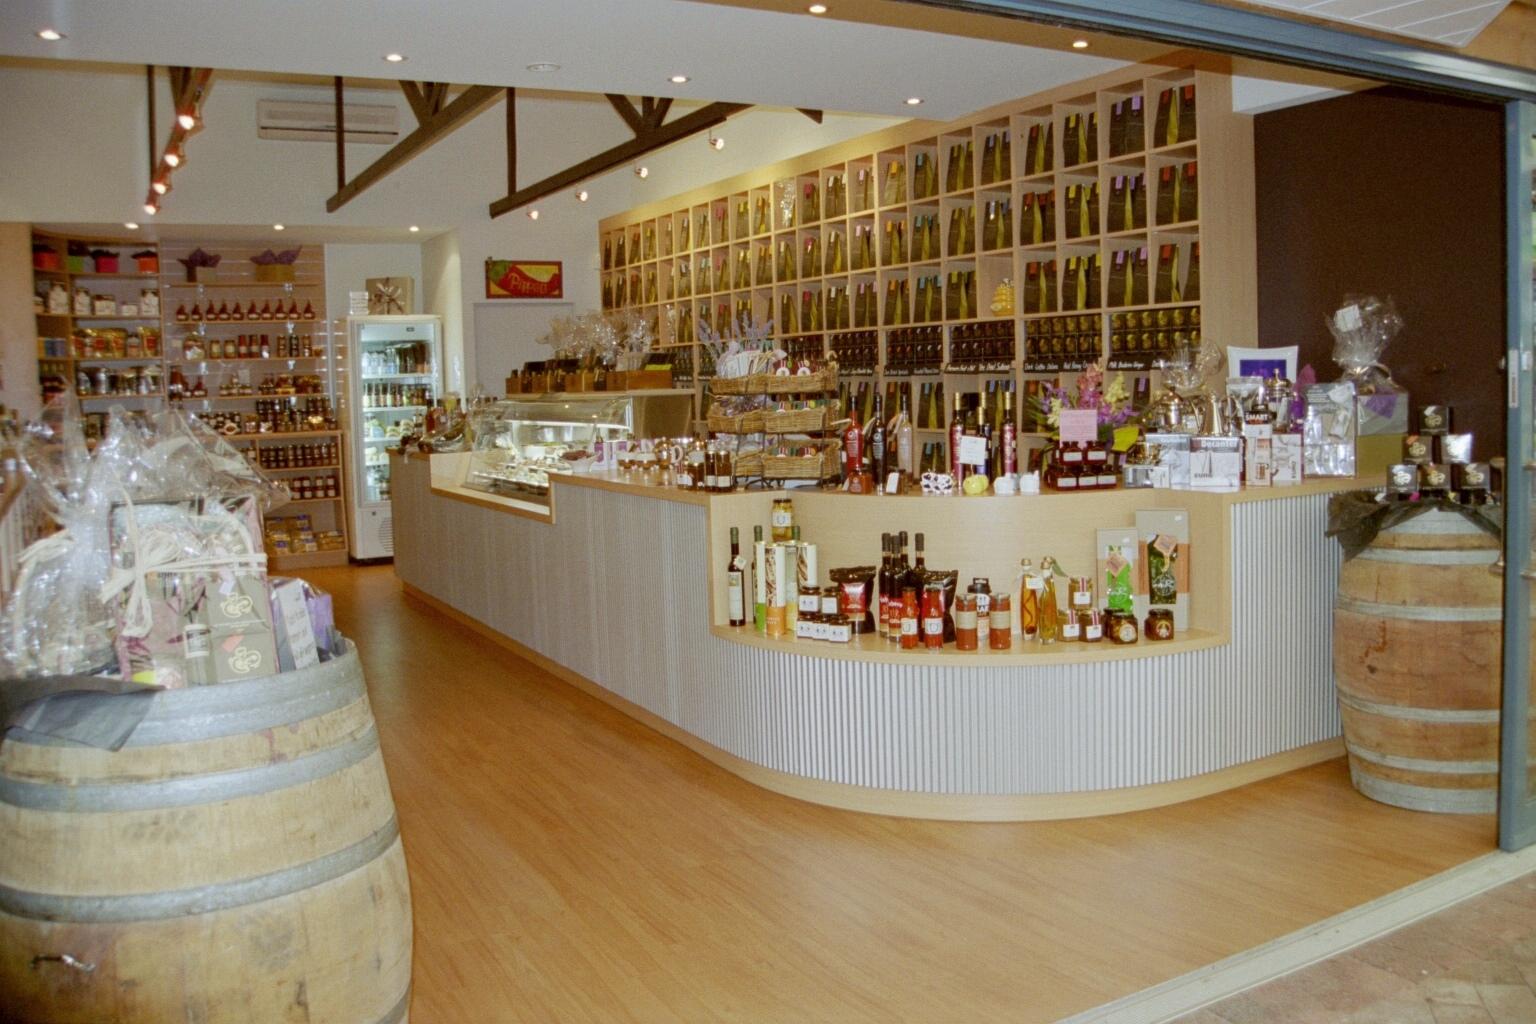 #margaretriverchocolate #margaretriver #deign #interiordesign #coffee #chocolate #hilarys #oldschool